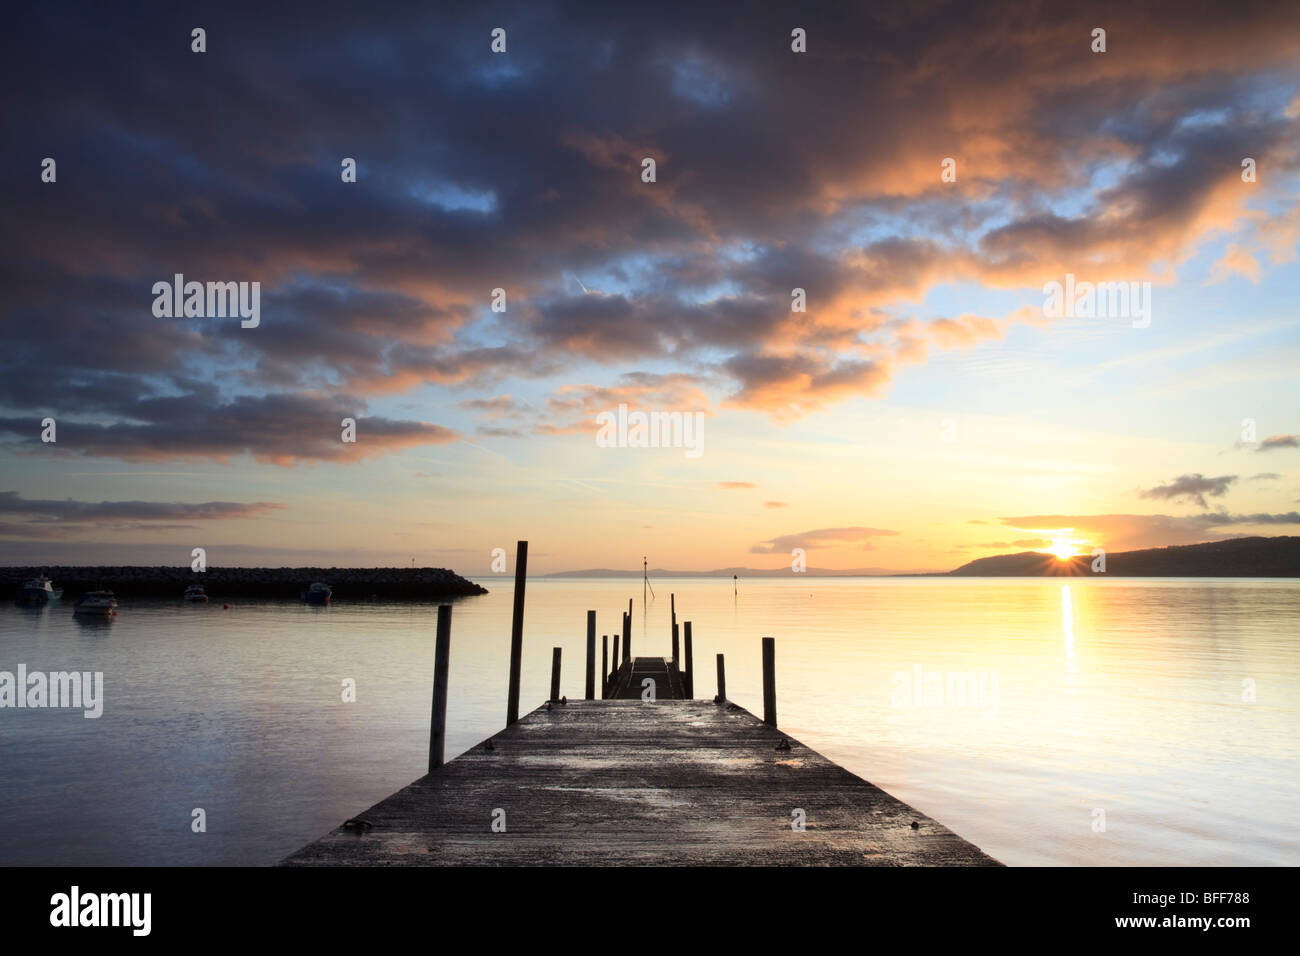 sunrise over Rhos on Sea, Llandrillo, Conwy, Wales, UK - Stock Image